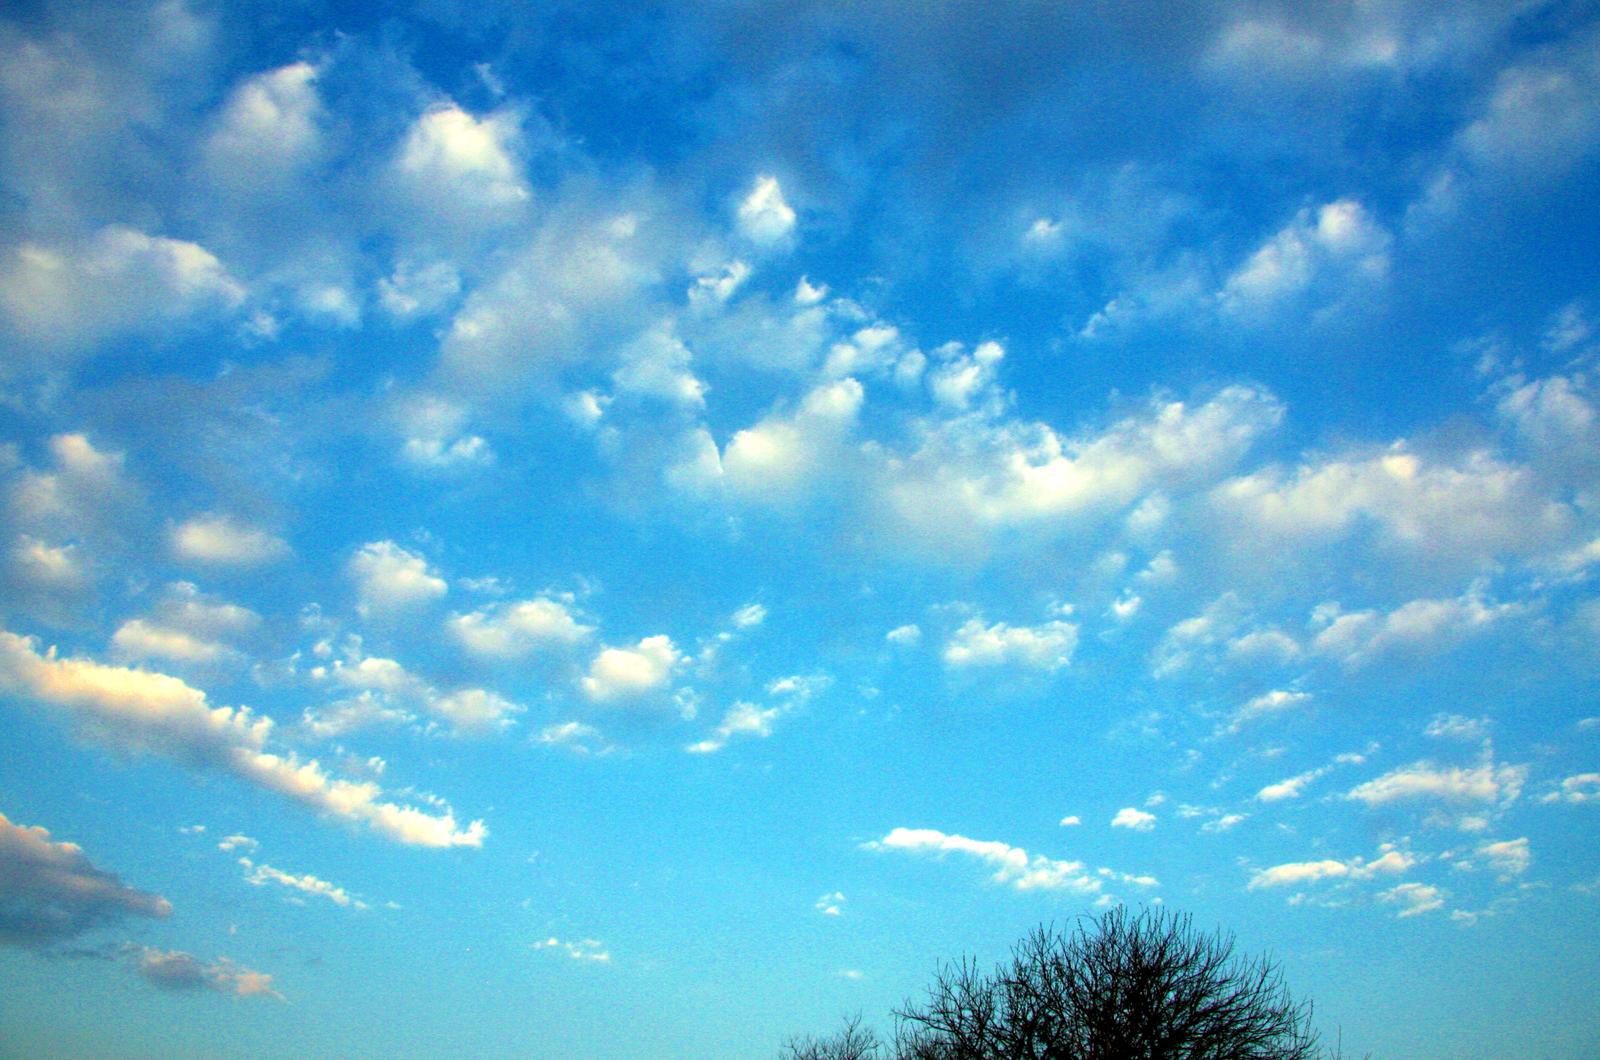 Dreamy Clouds by joybelle on DeviantArt